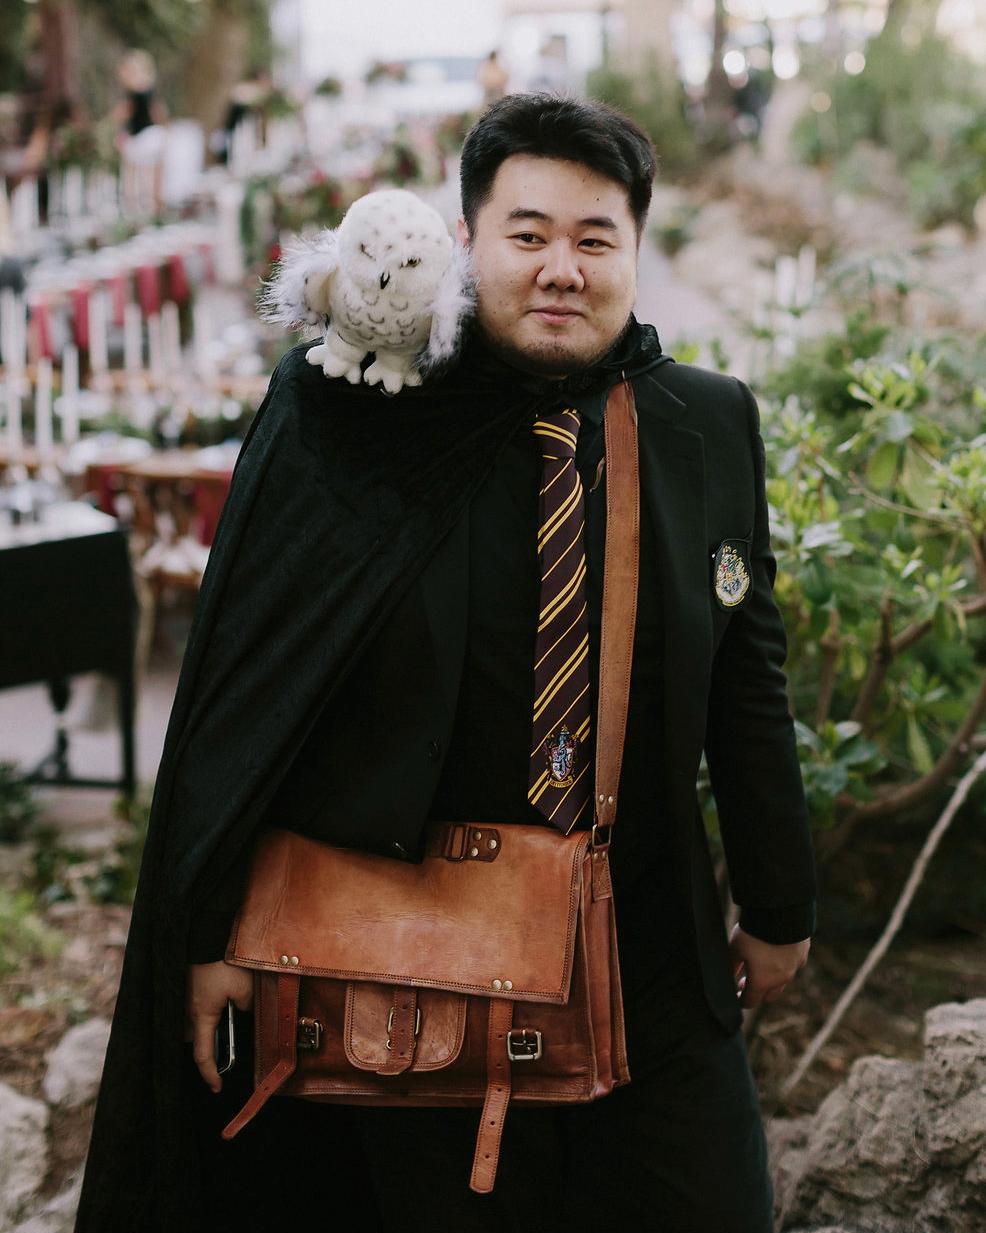 harry potter wedding guest